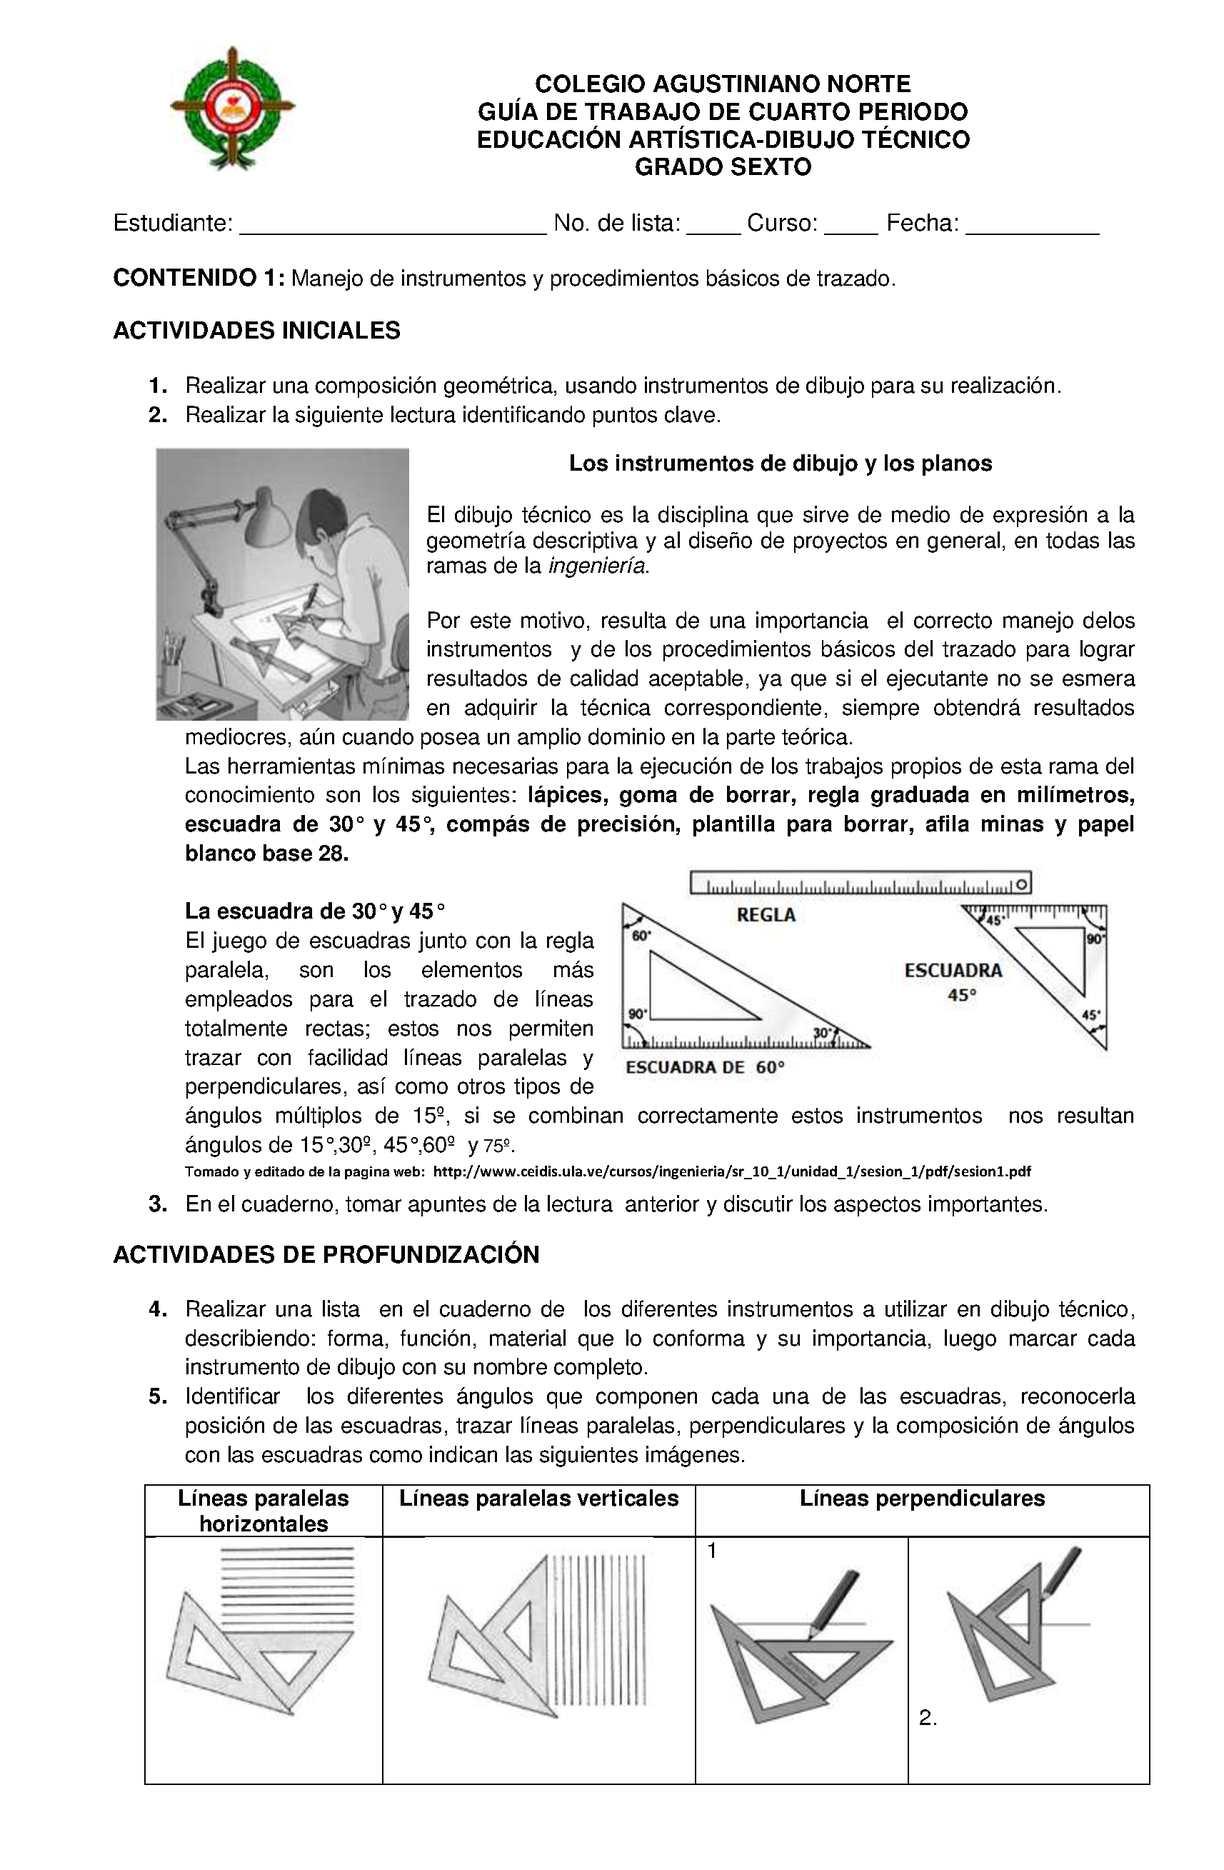 Calaméo - GUIA DE TRABAJO DIBUJO TÉCNICO SEXTO